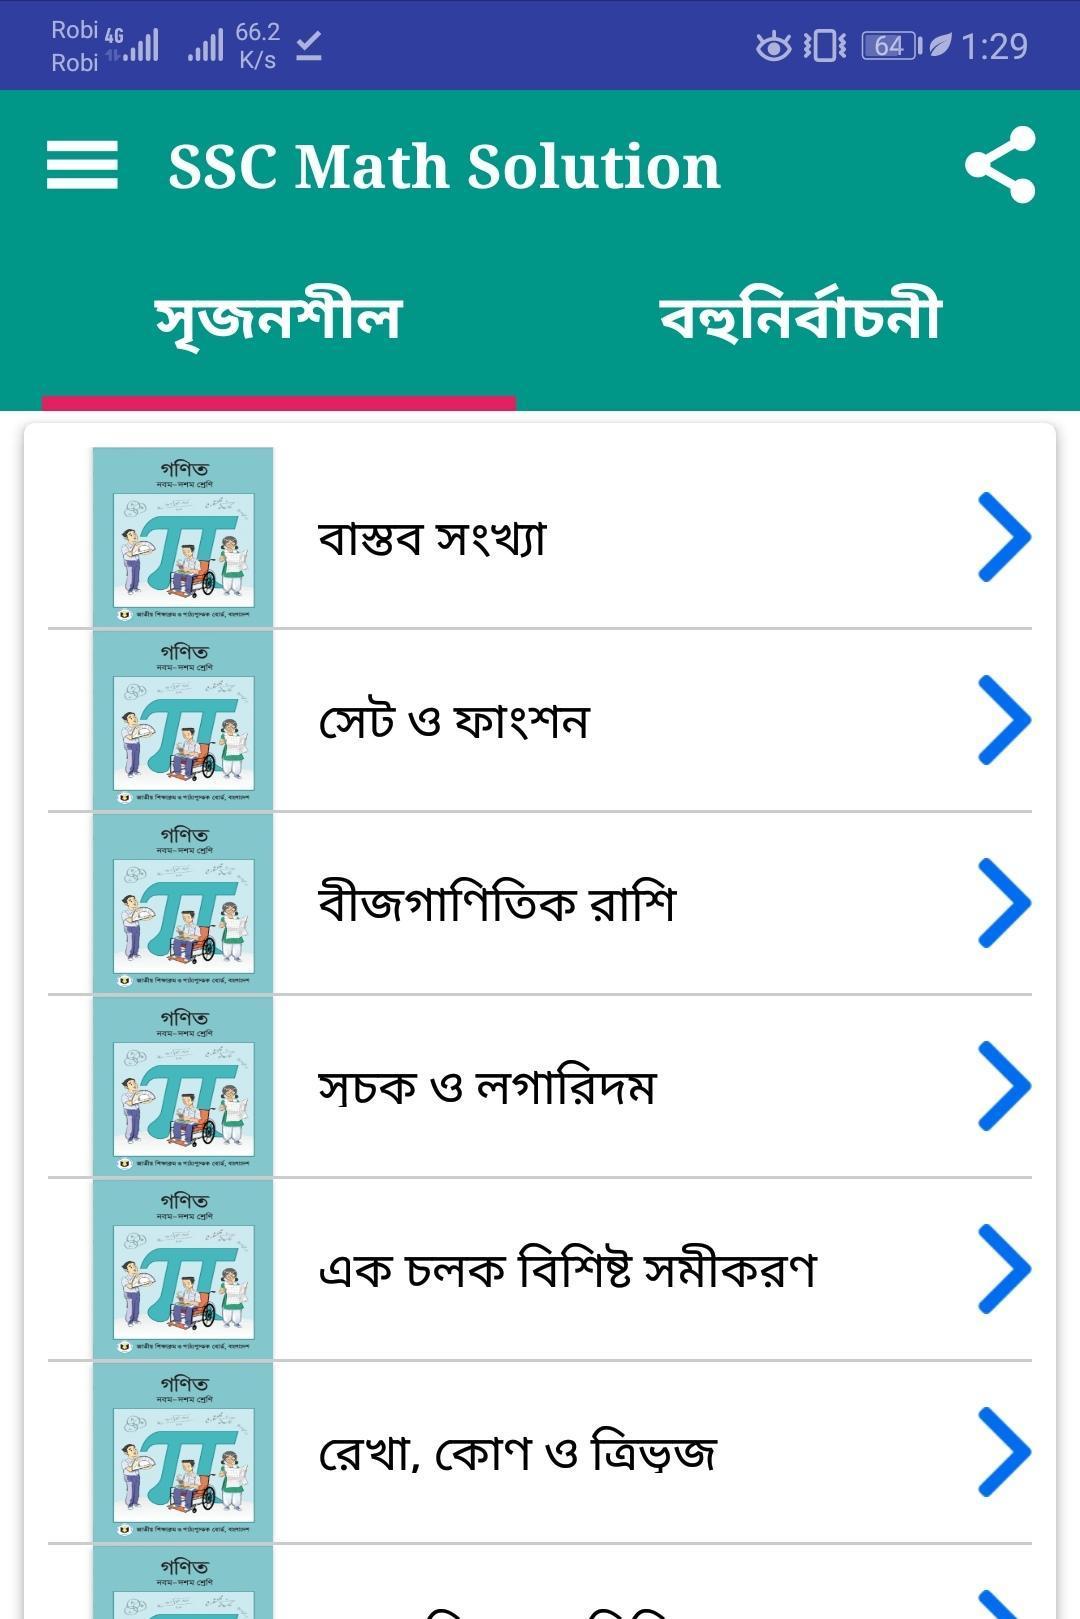 Class 9-10 Math Solution Bangladesh (গণিত নোট) for